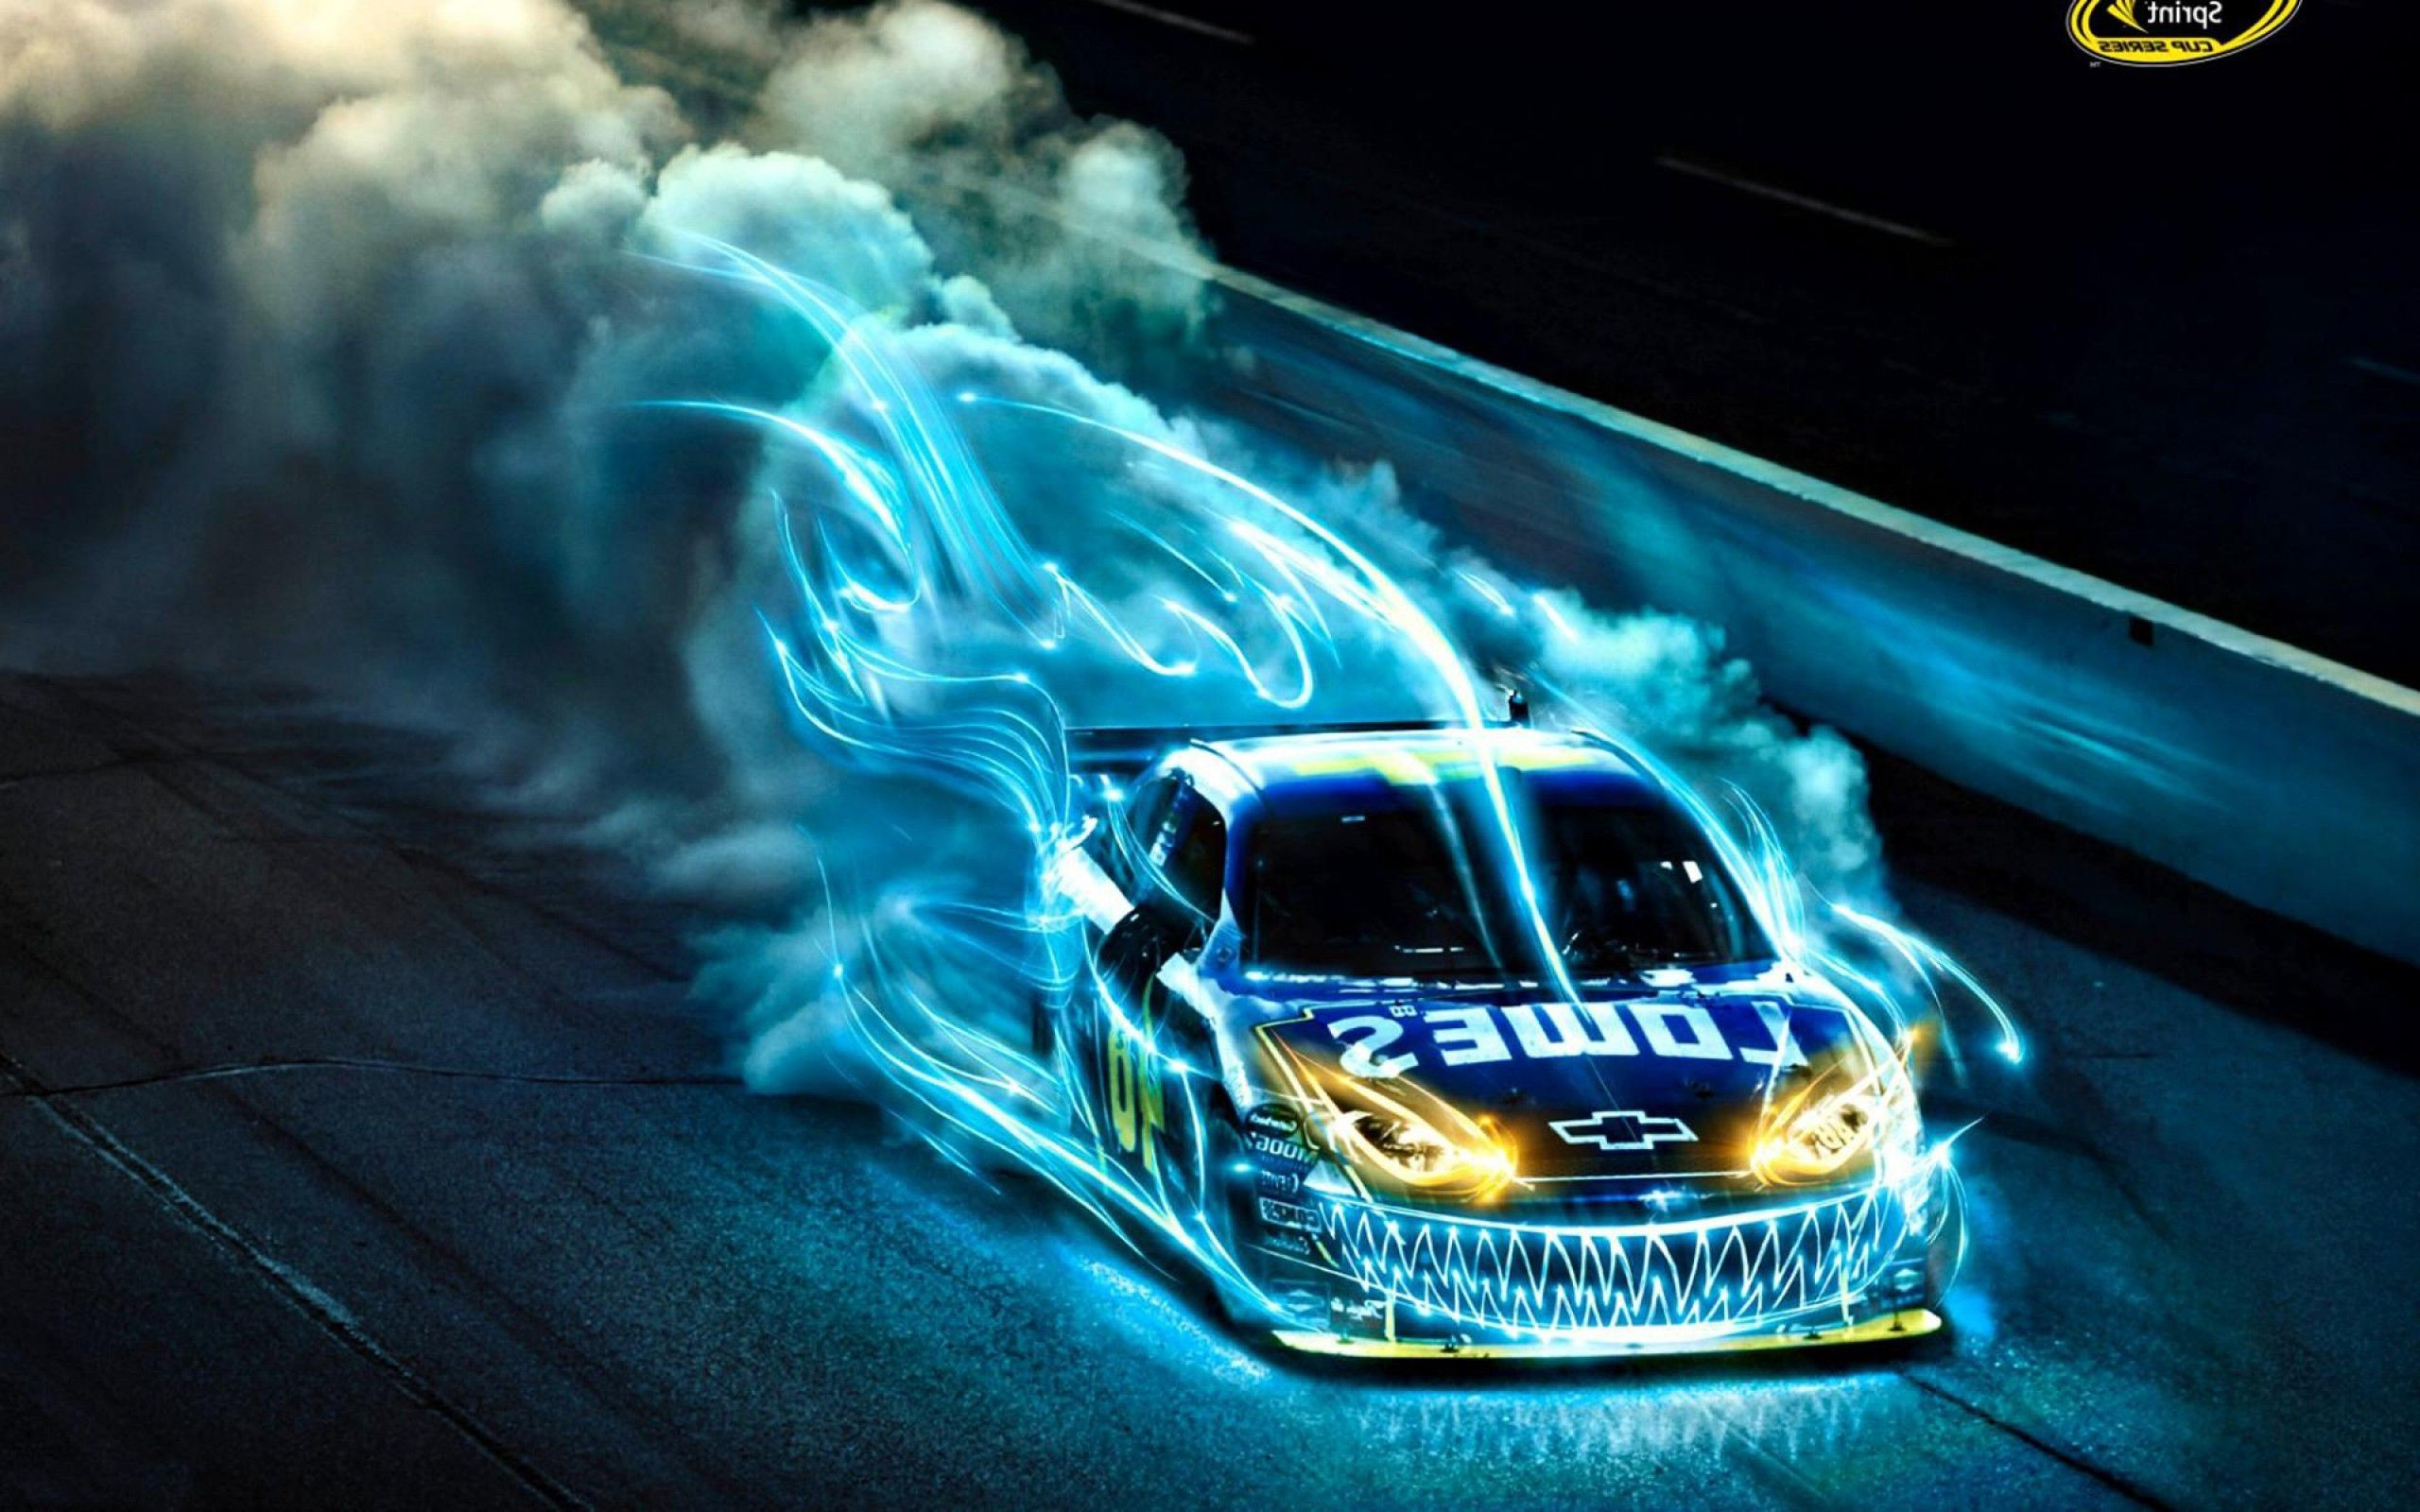 Street Racing Car Wallpaper 64 Pictures